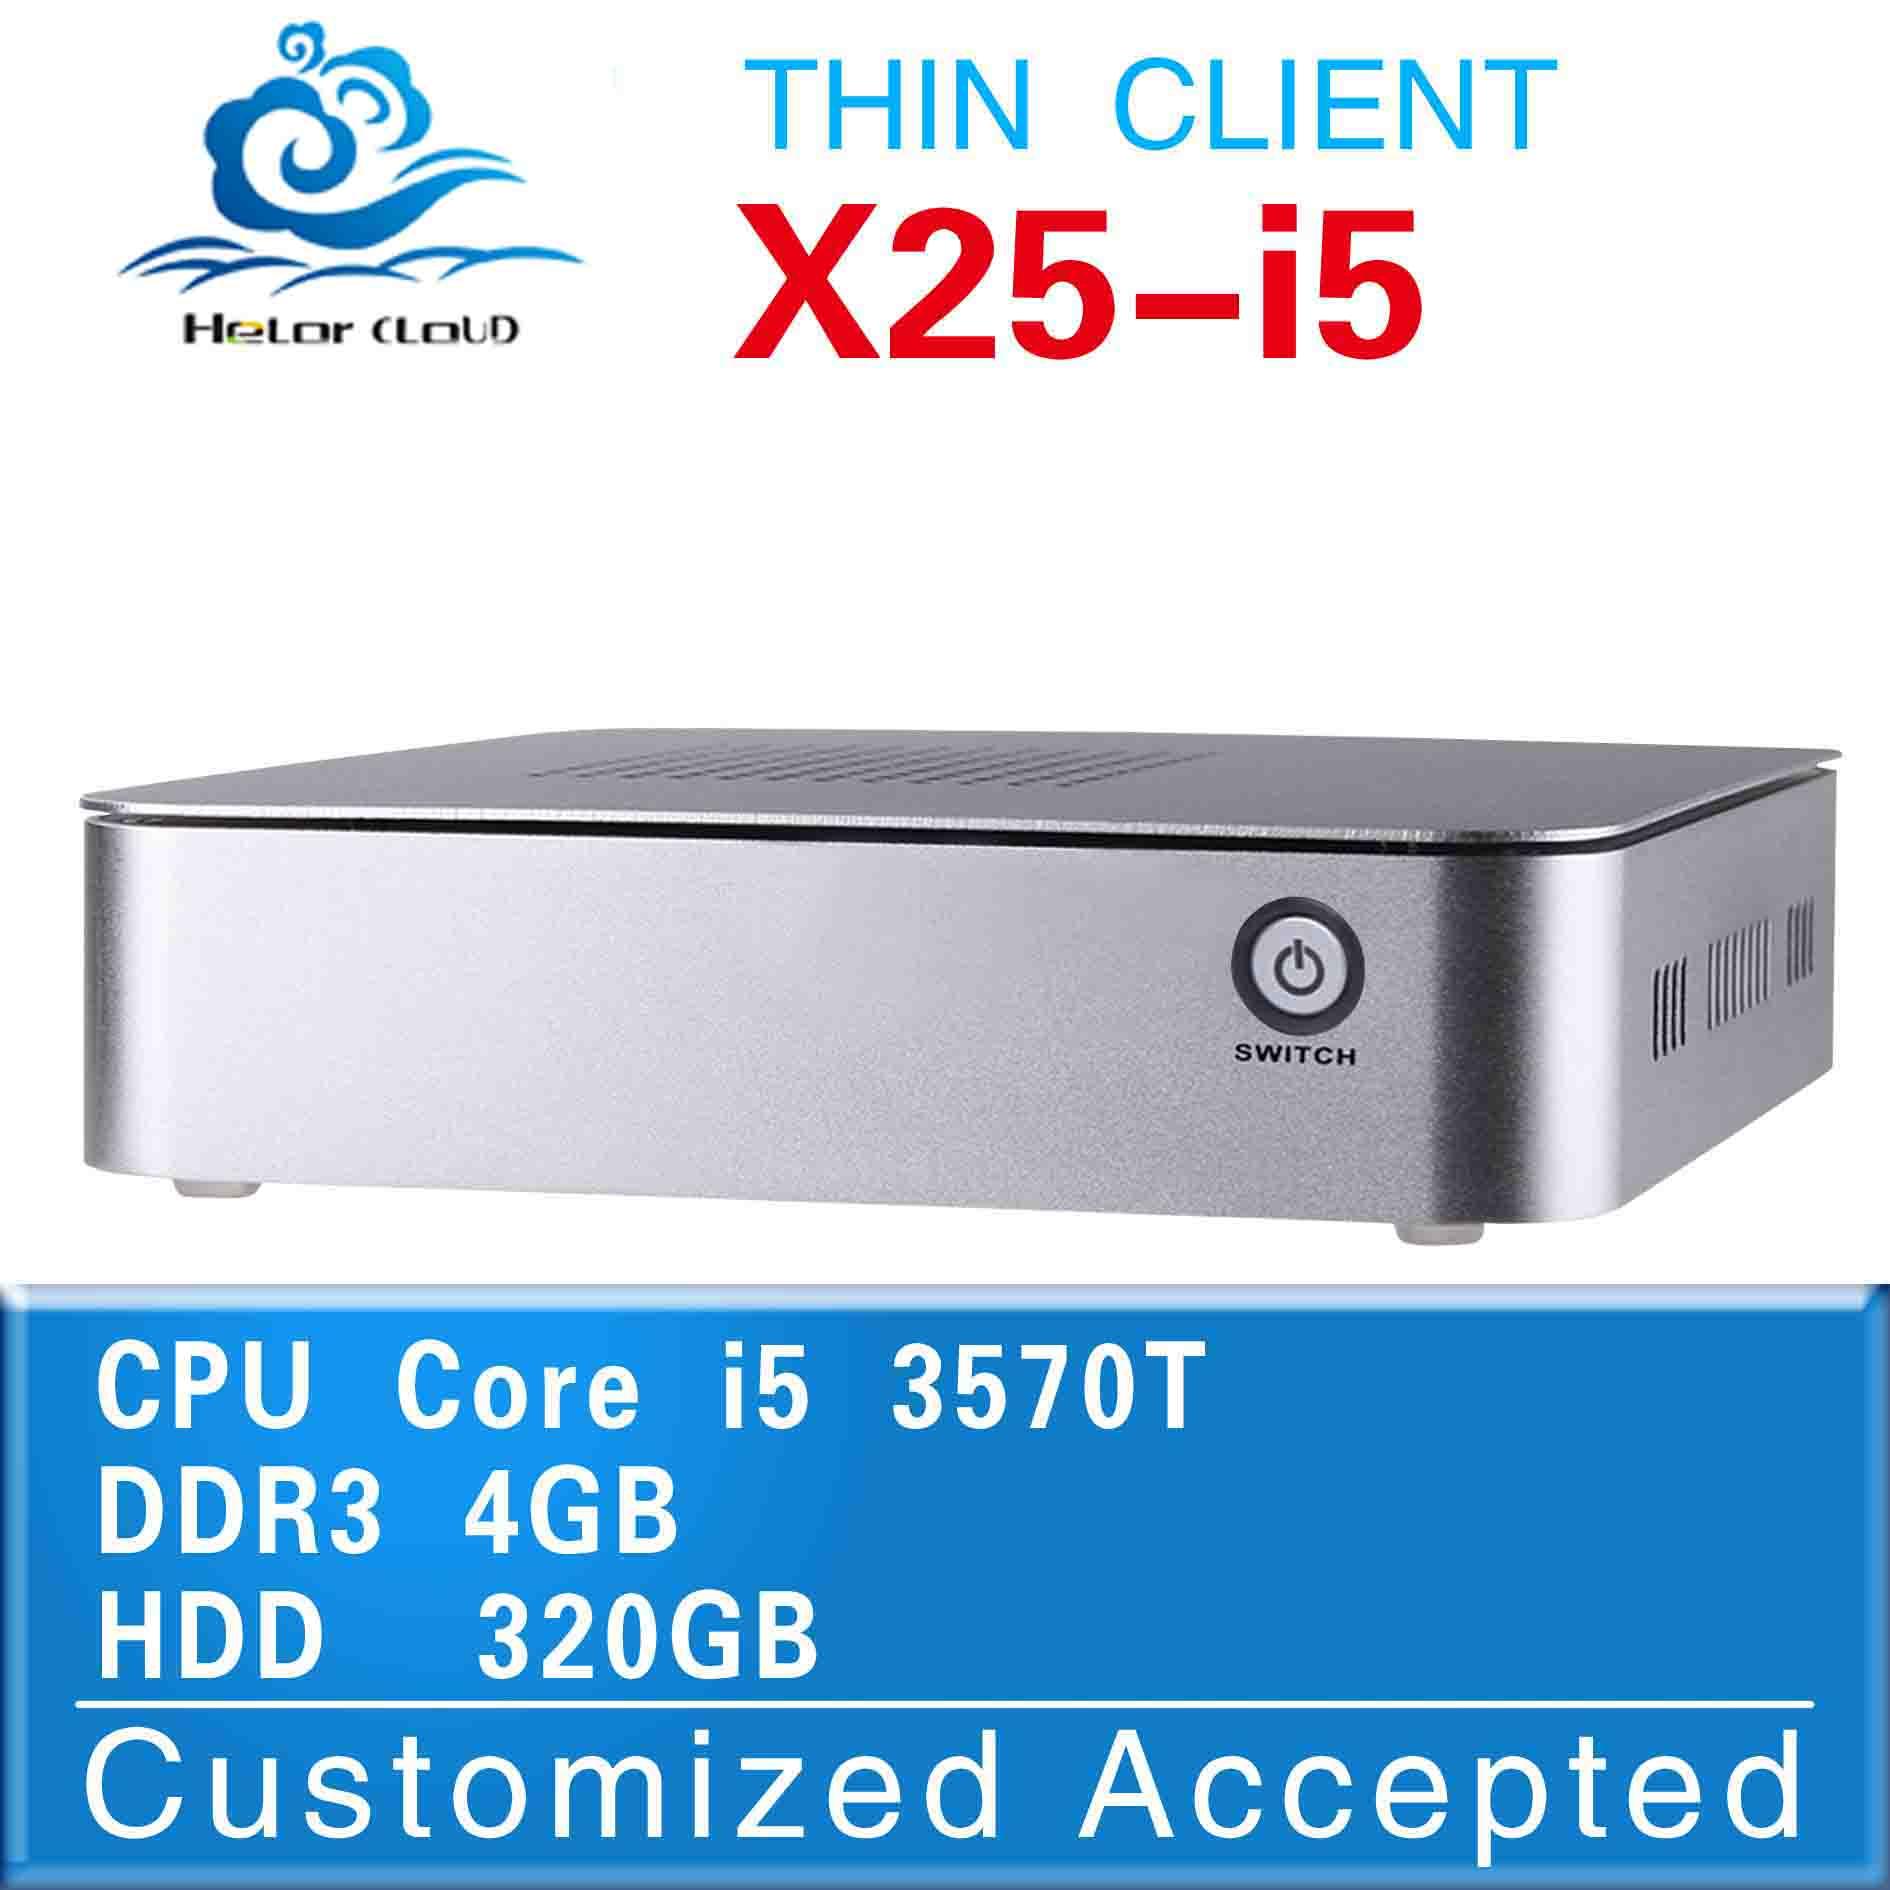 Fan Design x25-i5 intel i5 2390T mini pc linux hdmi desktop computer case 4gb ram 320gb ssd thin client support screen movies(China (Mainland))